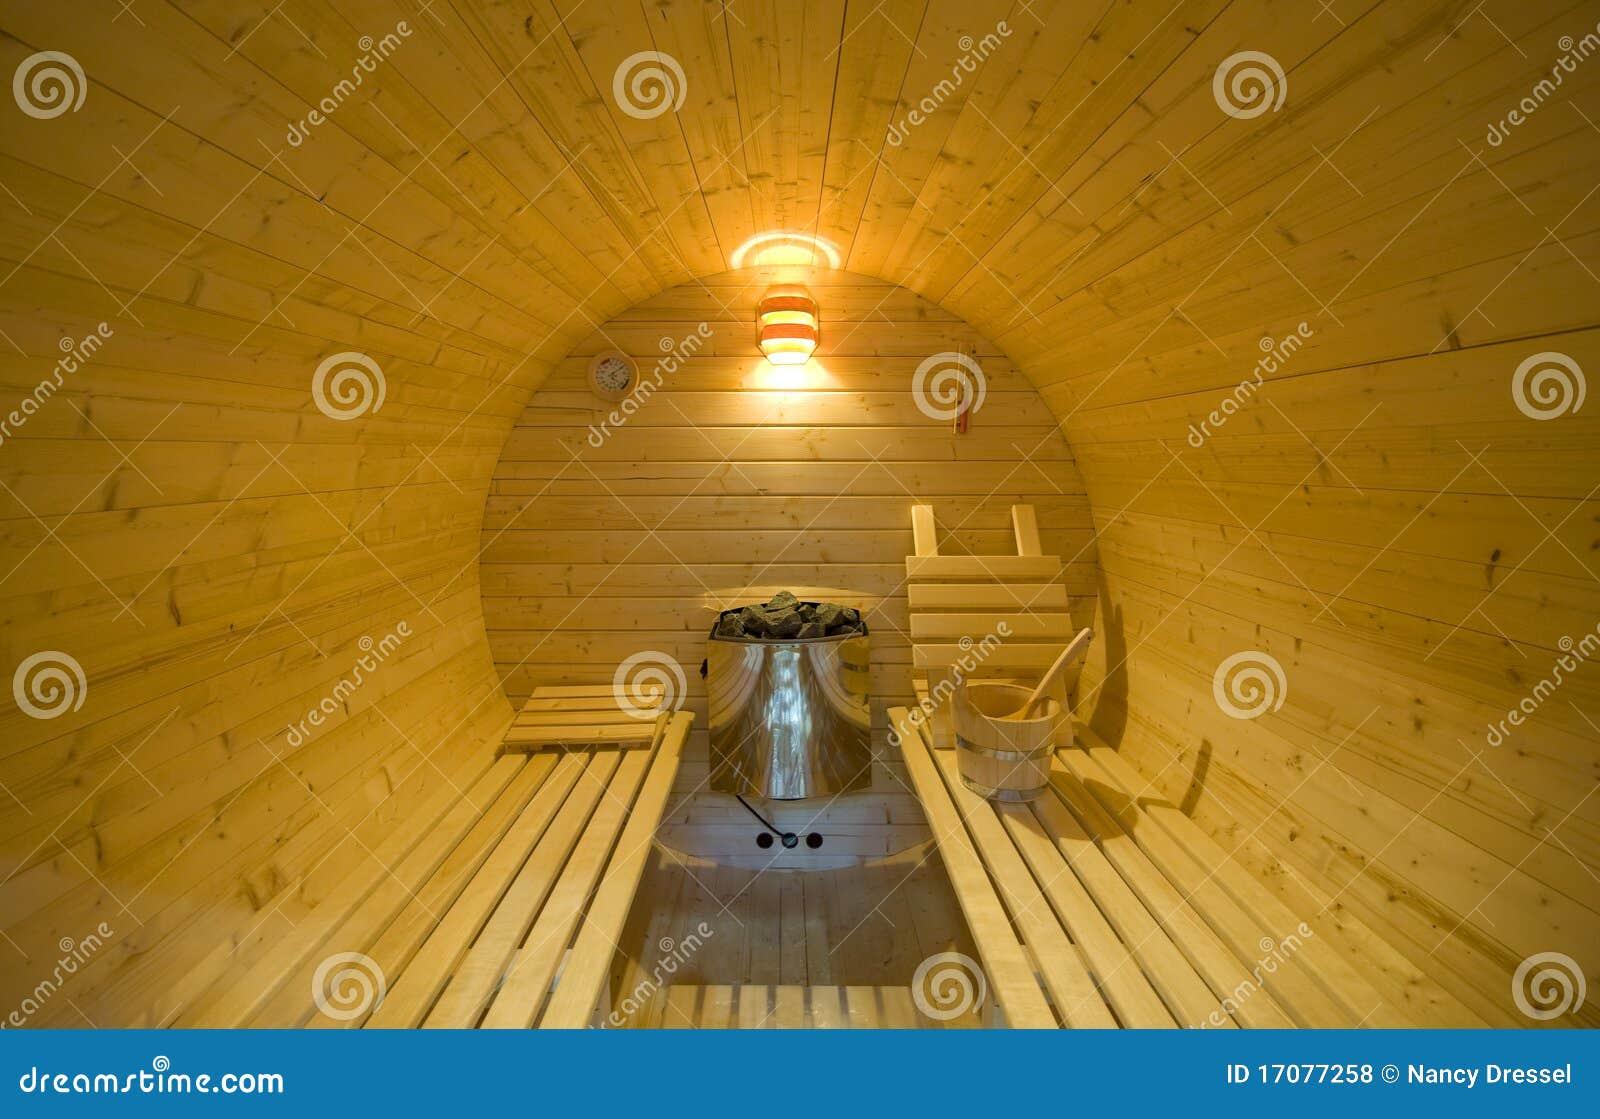 Round Sauna Royalty Free Stock Photos Image 17077258